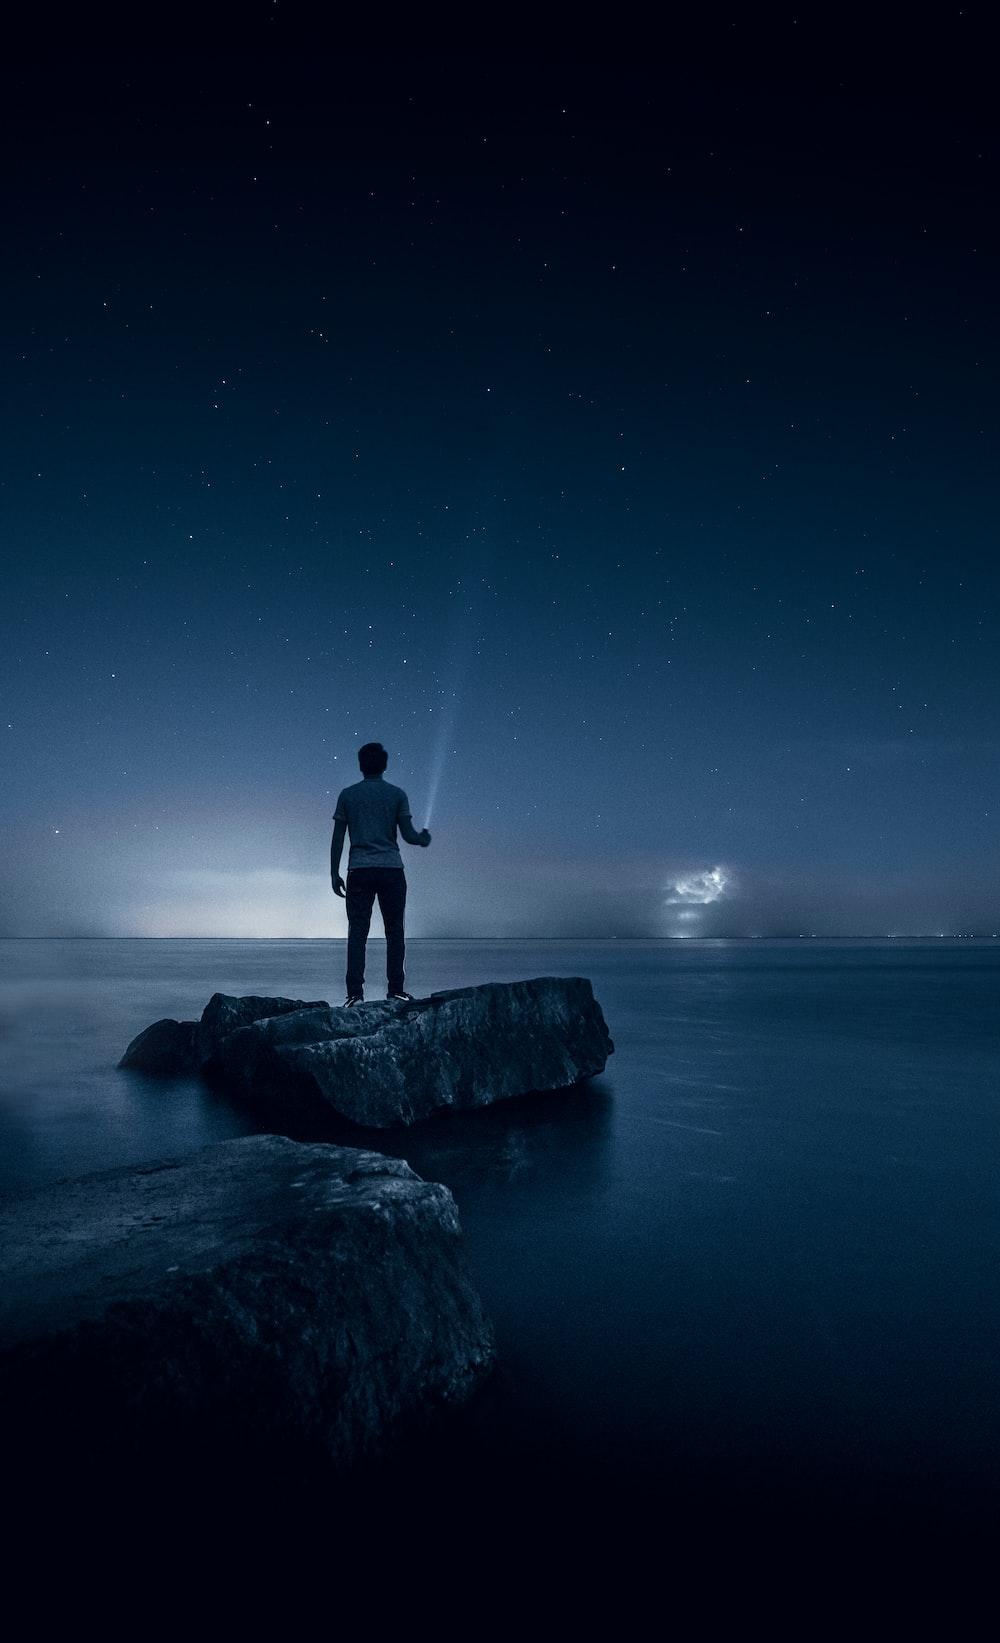 man holding flashlight standing on rock